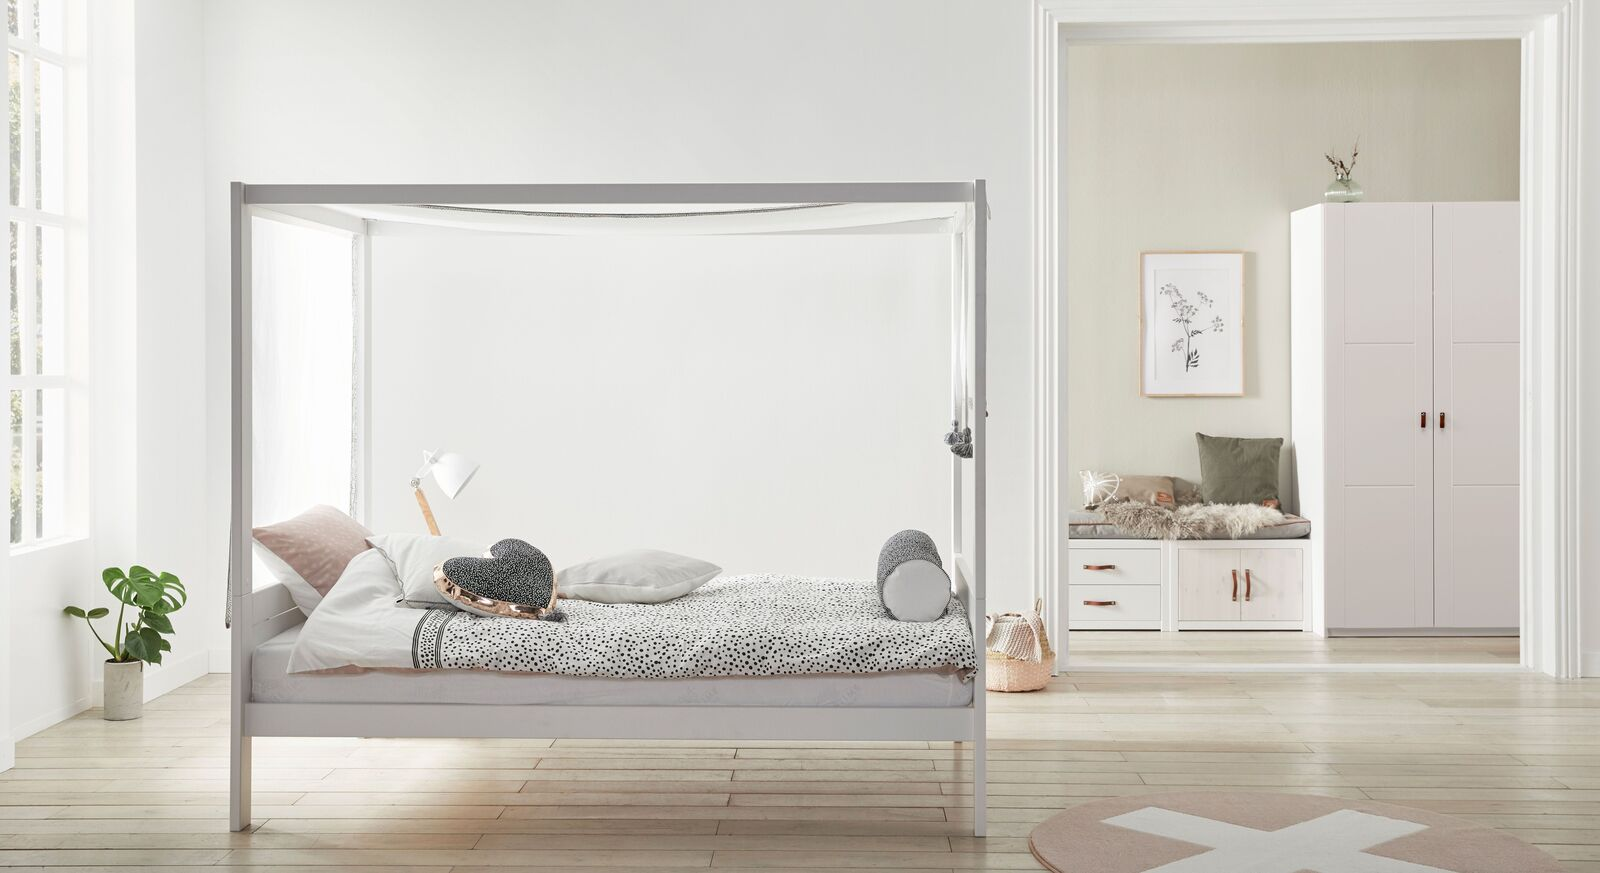 Komplett-Schlafzimmer Kiefer massiv mit Himmelbett - Living Style